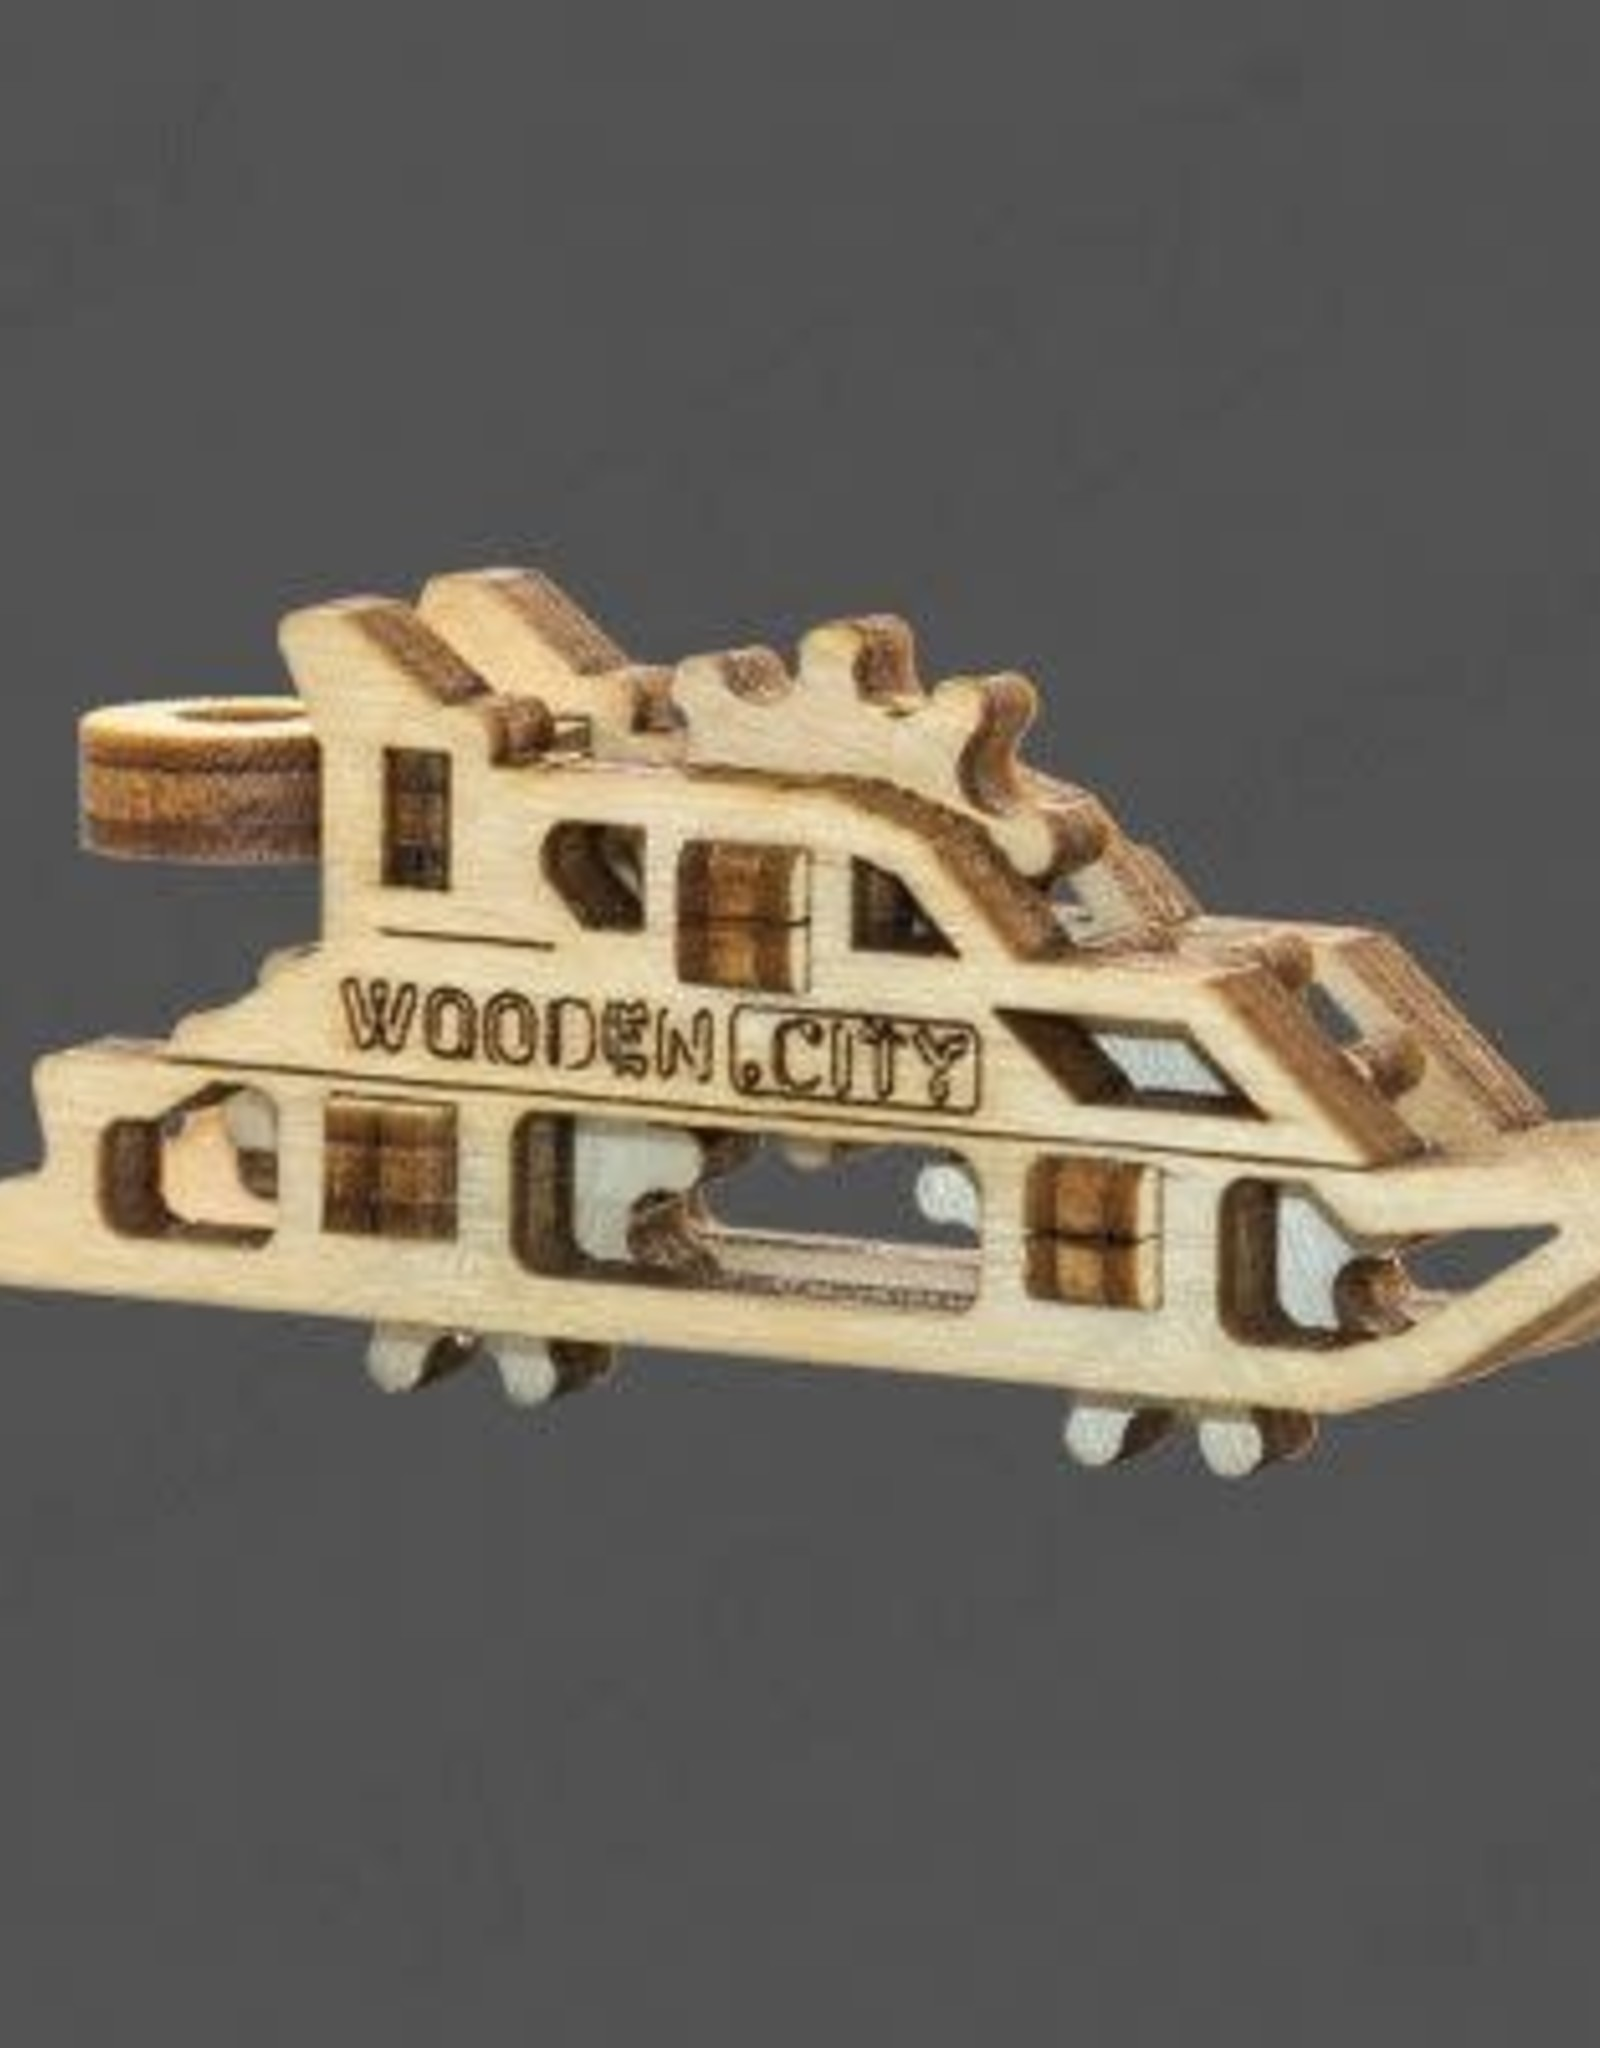 Wooden.City WoodenCity Widget Ships